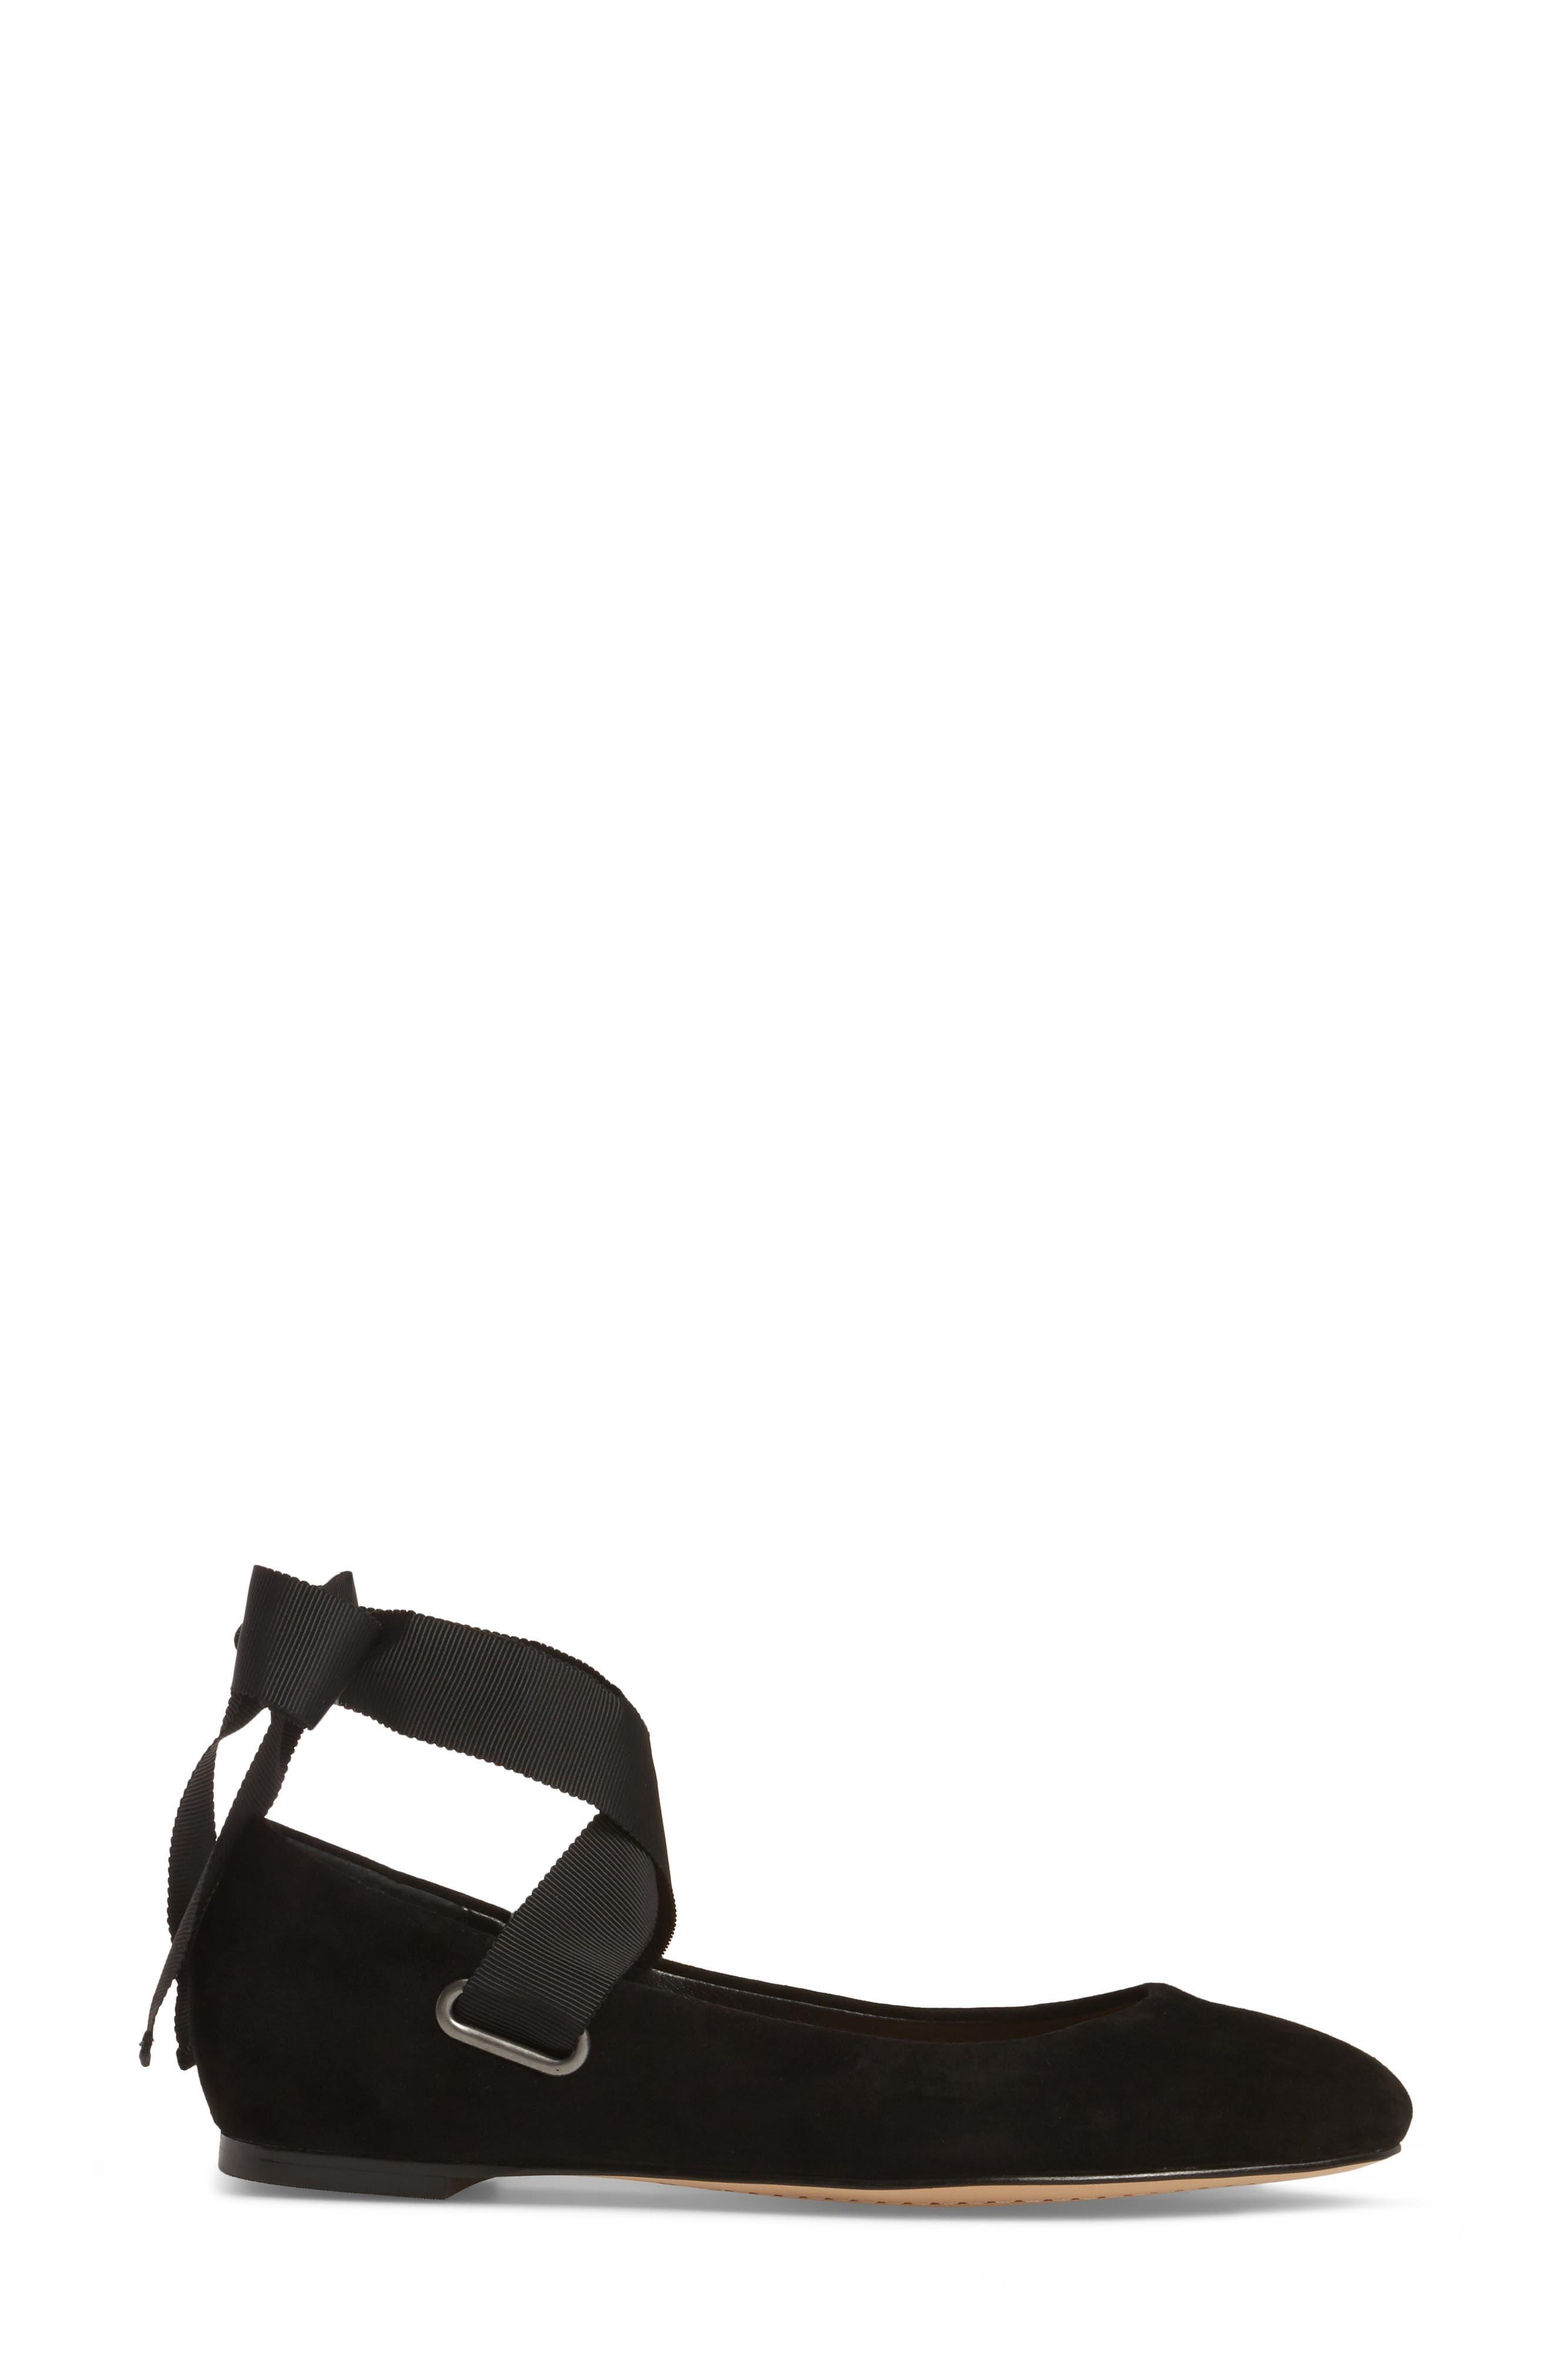 SPLENDID,                             Renee Ankle Tie Flat,                             Alternate thumbnail 3, color,                             013